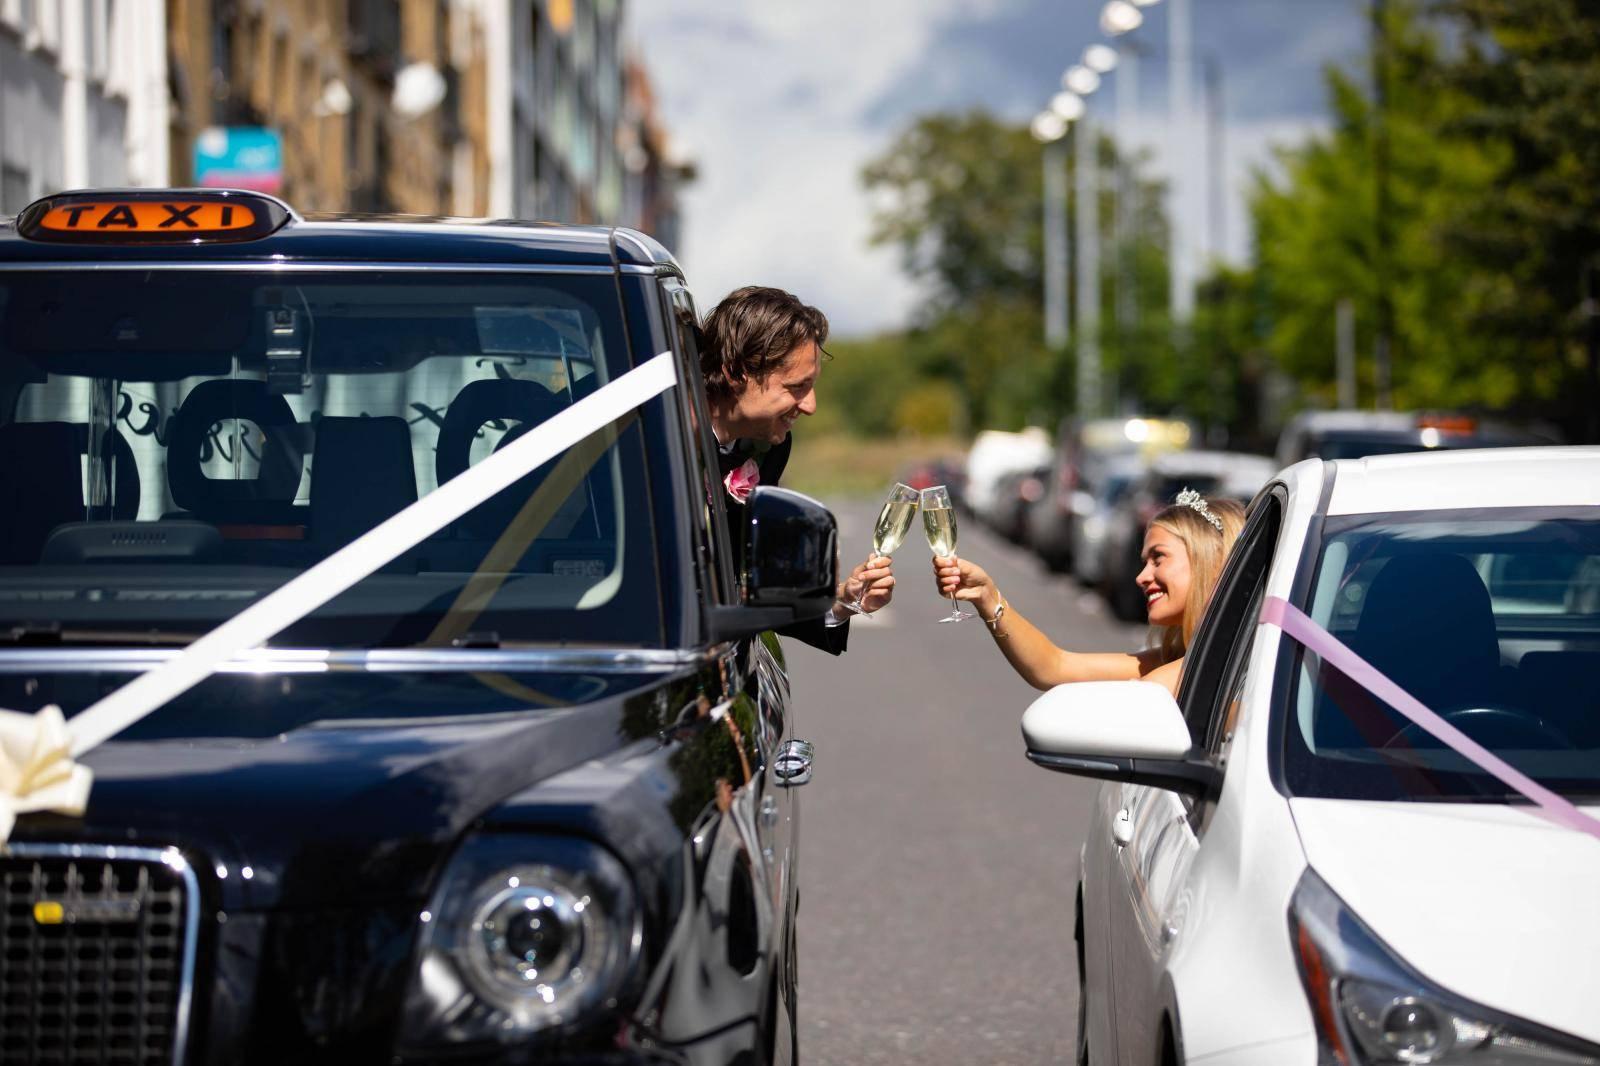 UK's first drive-through wedding service